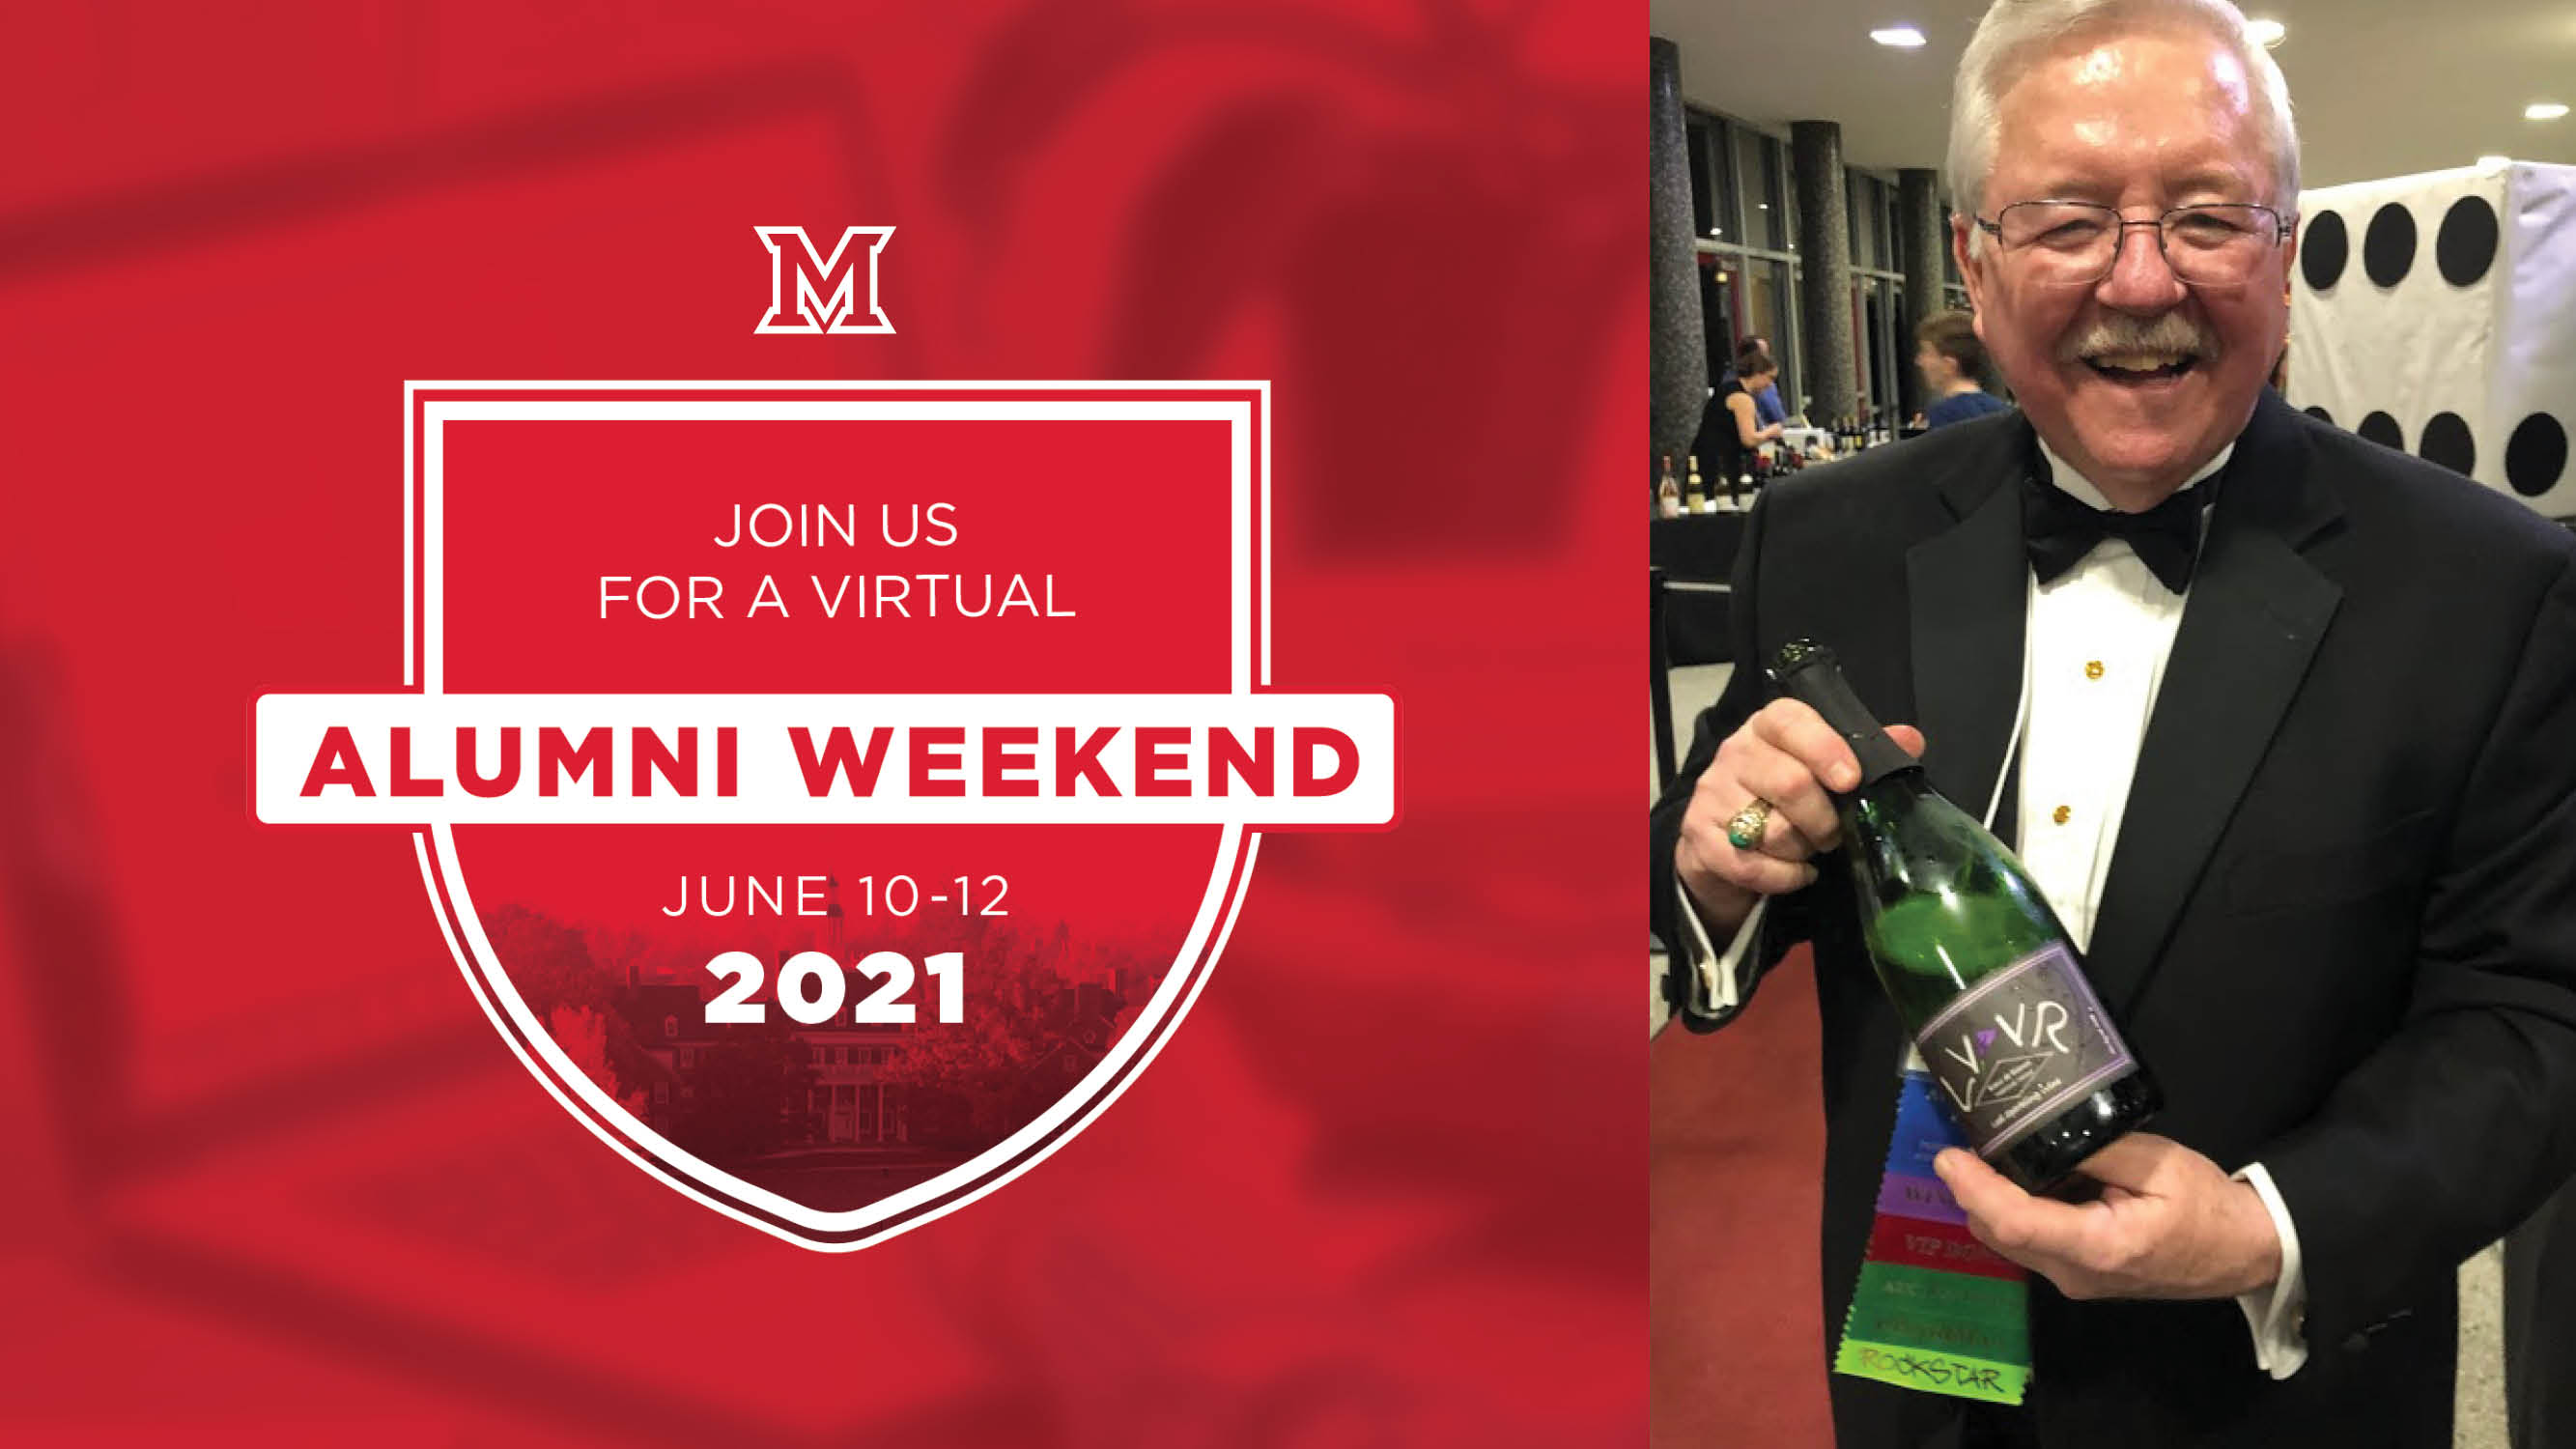 Image for Miami Presents Alumni Weekend: Kick-Off to Alumni Weekend Wine Tasting with Jack Keegan webinar